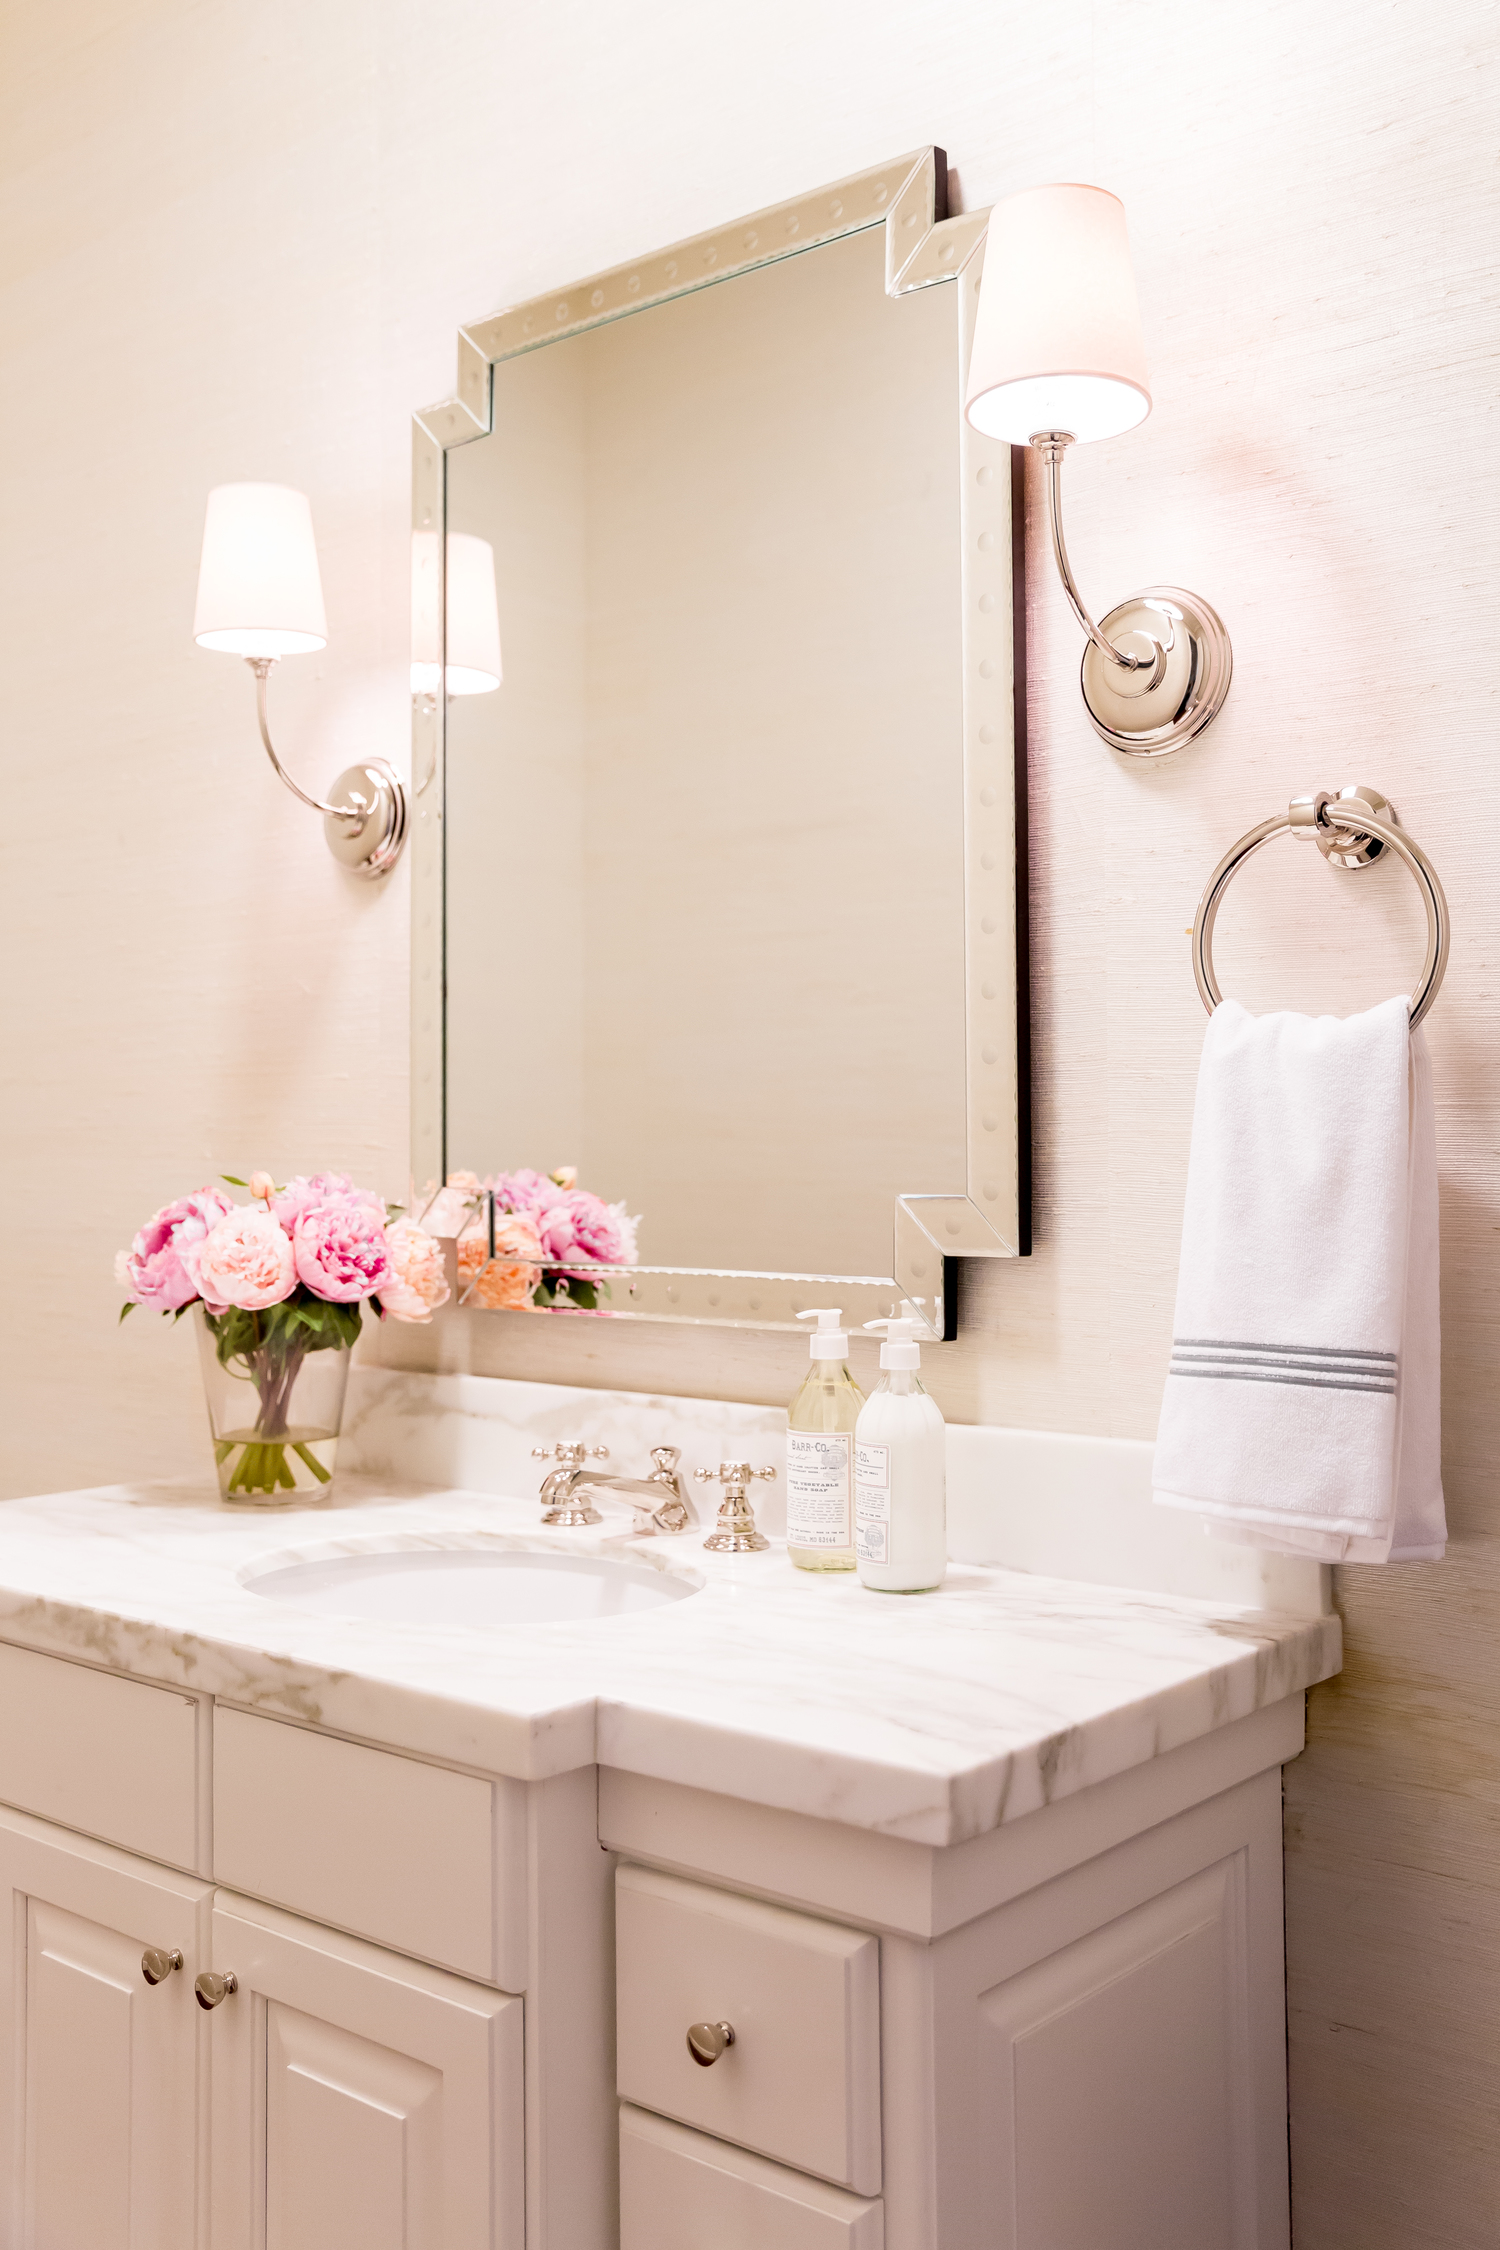 White bathroom vanity with mirror